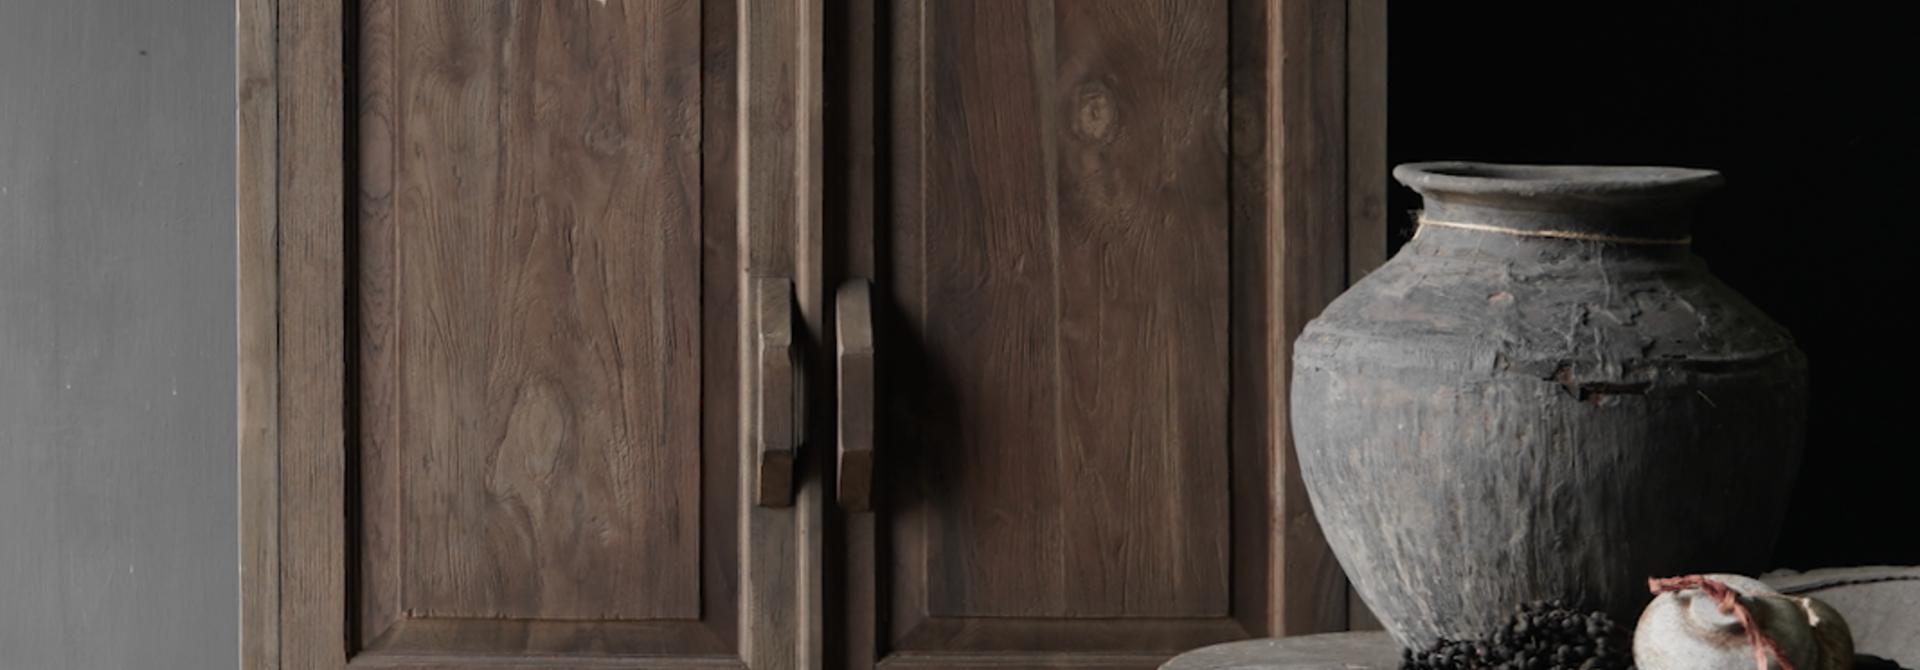 Prachtig   oud houten kast